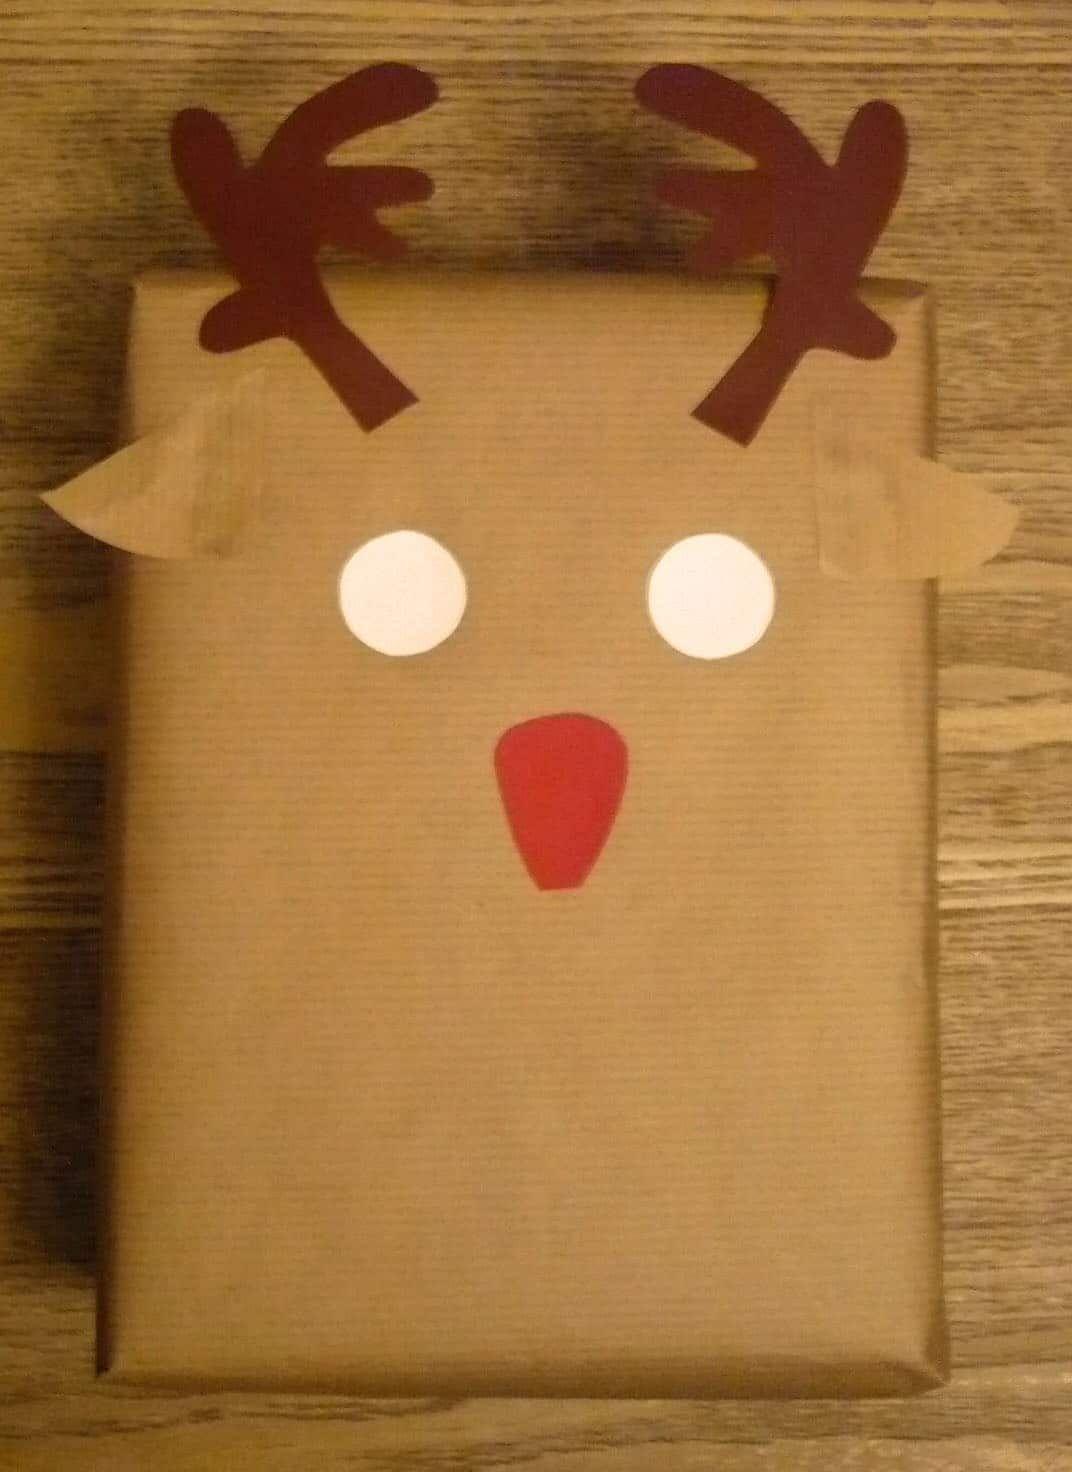 Emballage cadeau de Noël : le renne - Emballage cadeau #emballagecadeauoriginal Emballage cadeau de Noël : le renne - Emballage cadeau #emballagecadeauoriginal Emballage cadeau de Noël : le renne - Emballage cadeau #emballagecadeauoriginal Emballage cadeau de Noël : le renne - Emballage cadeau #emballagecadeauoriginal